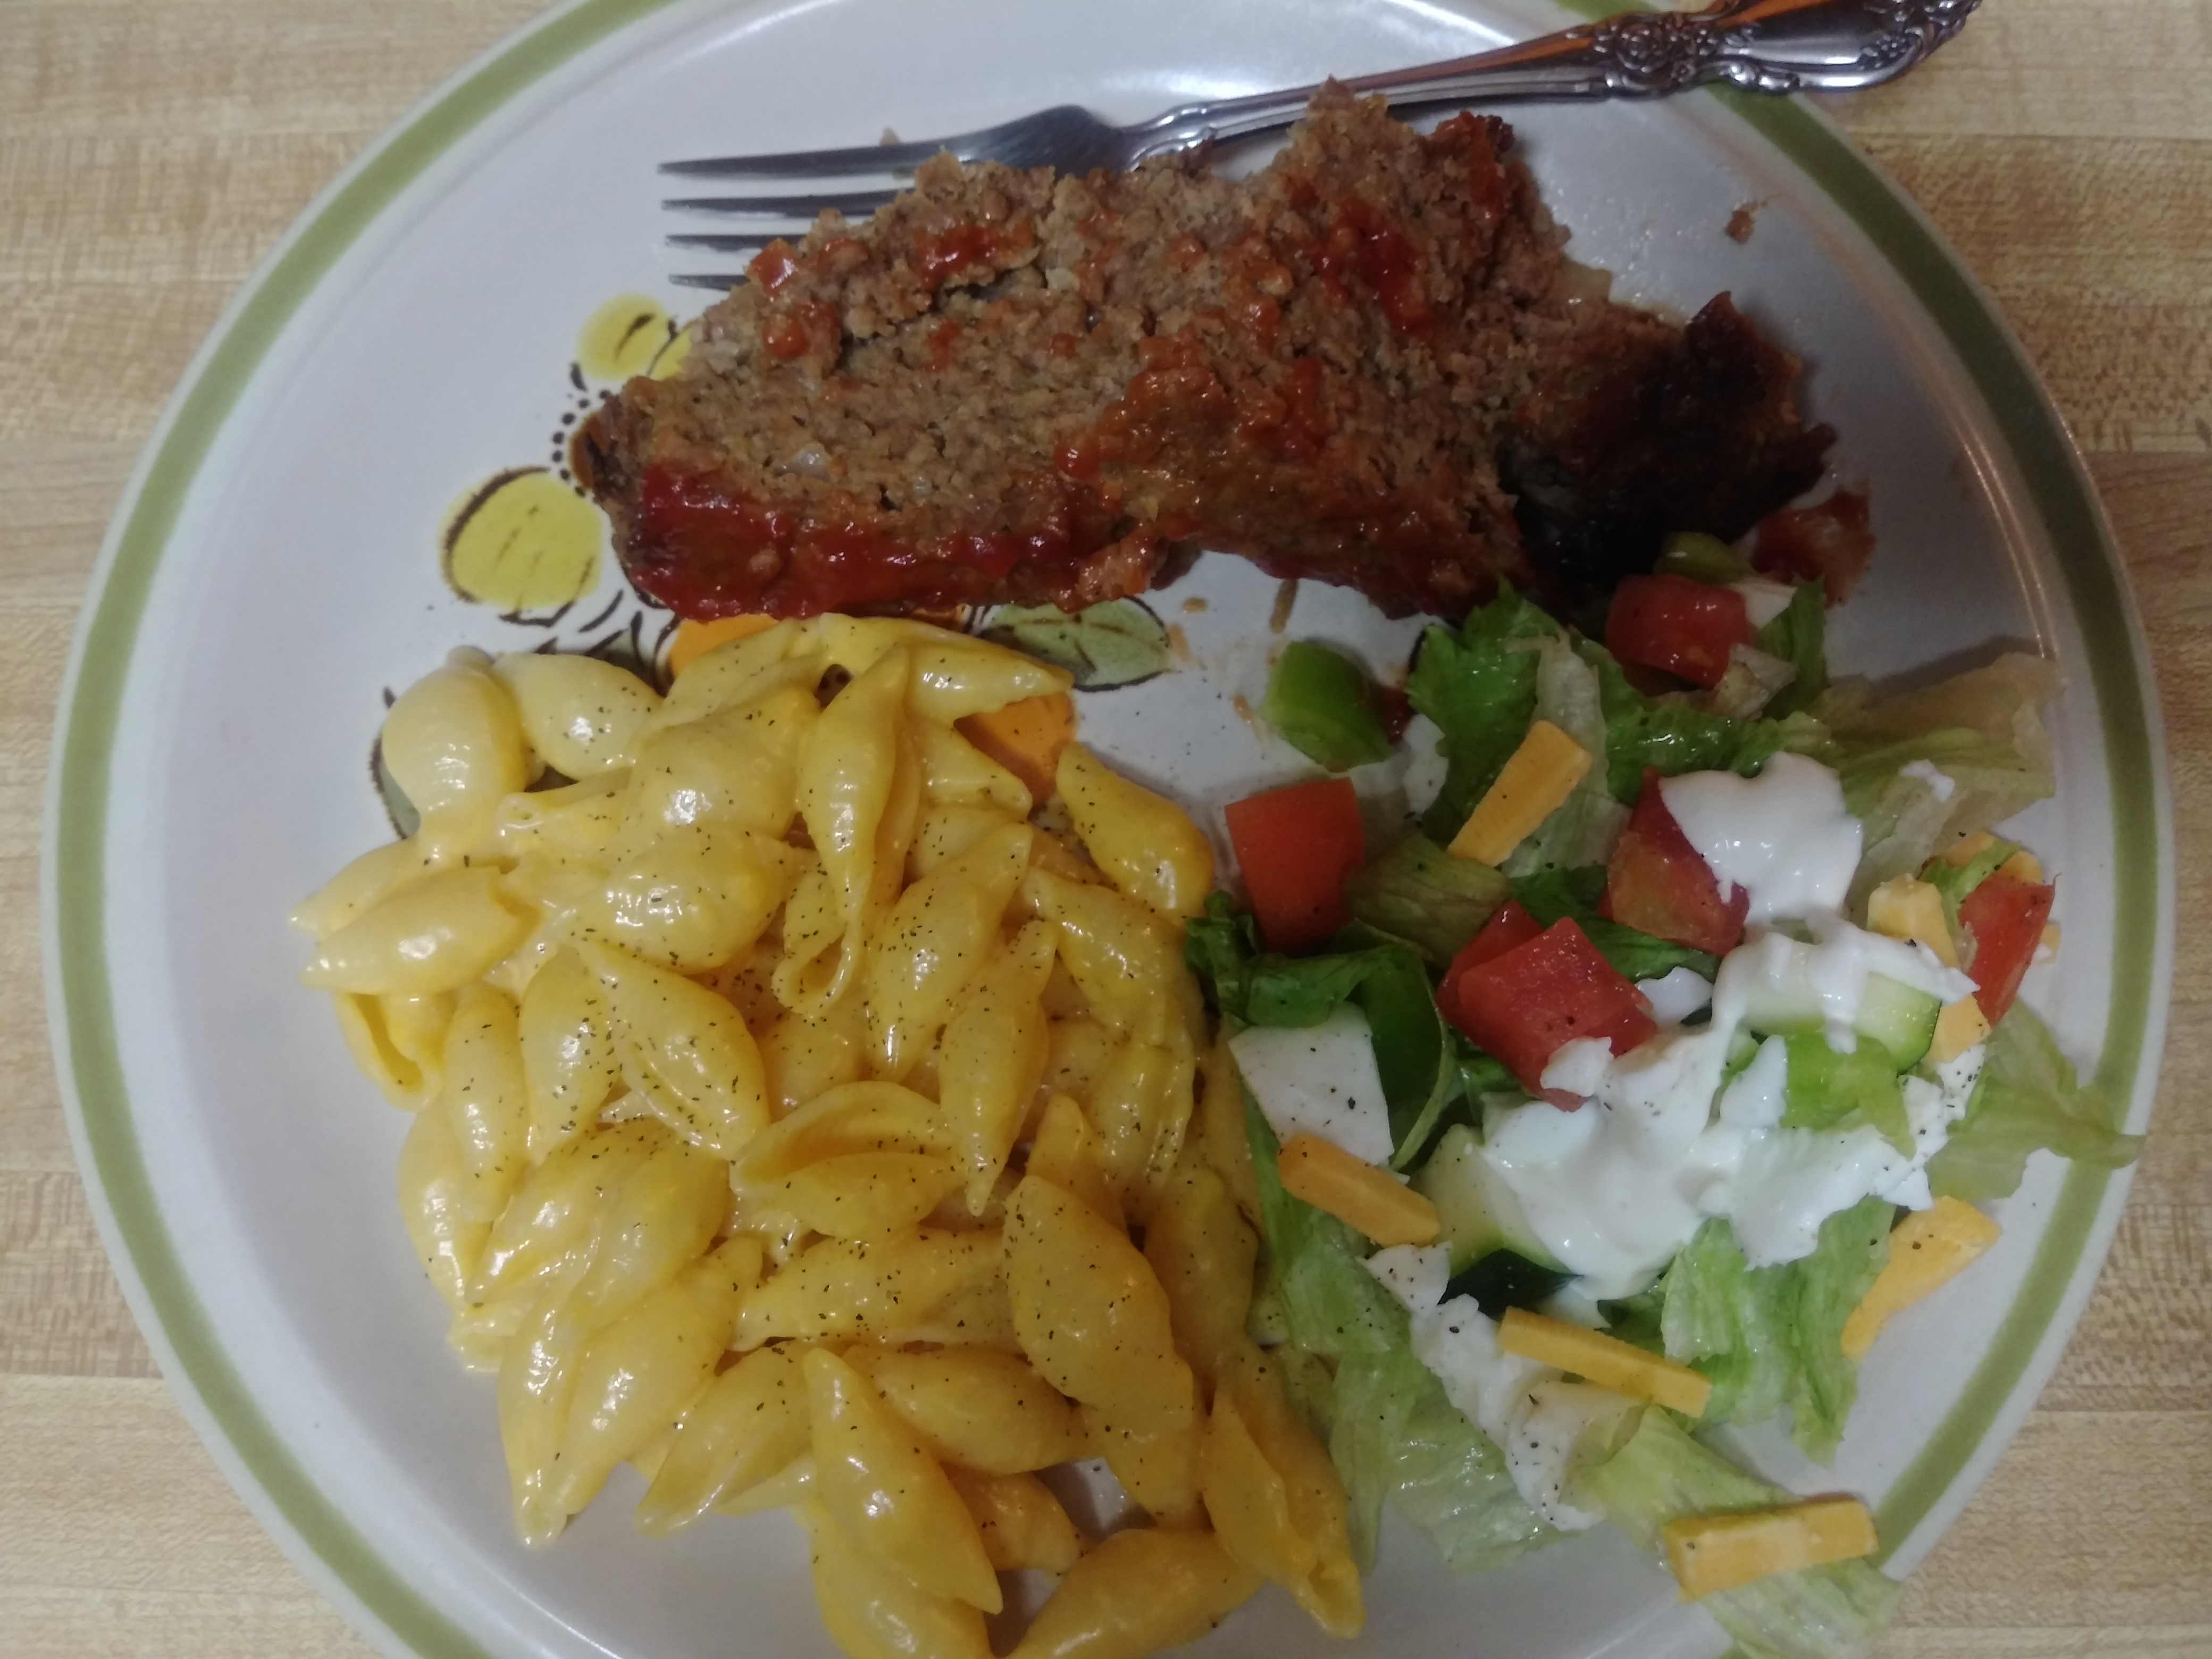 Restaurant Style Mac and Cheese Rachella